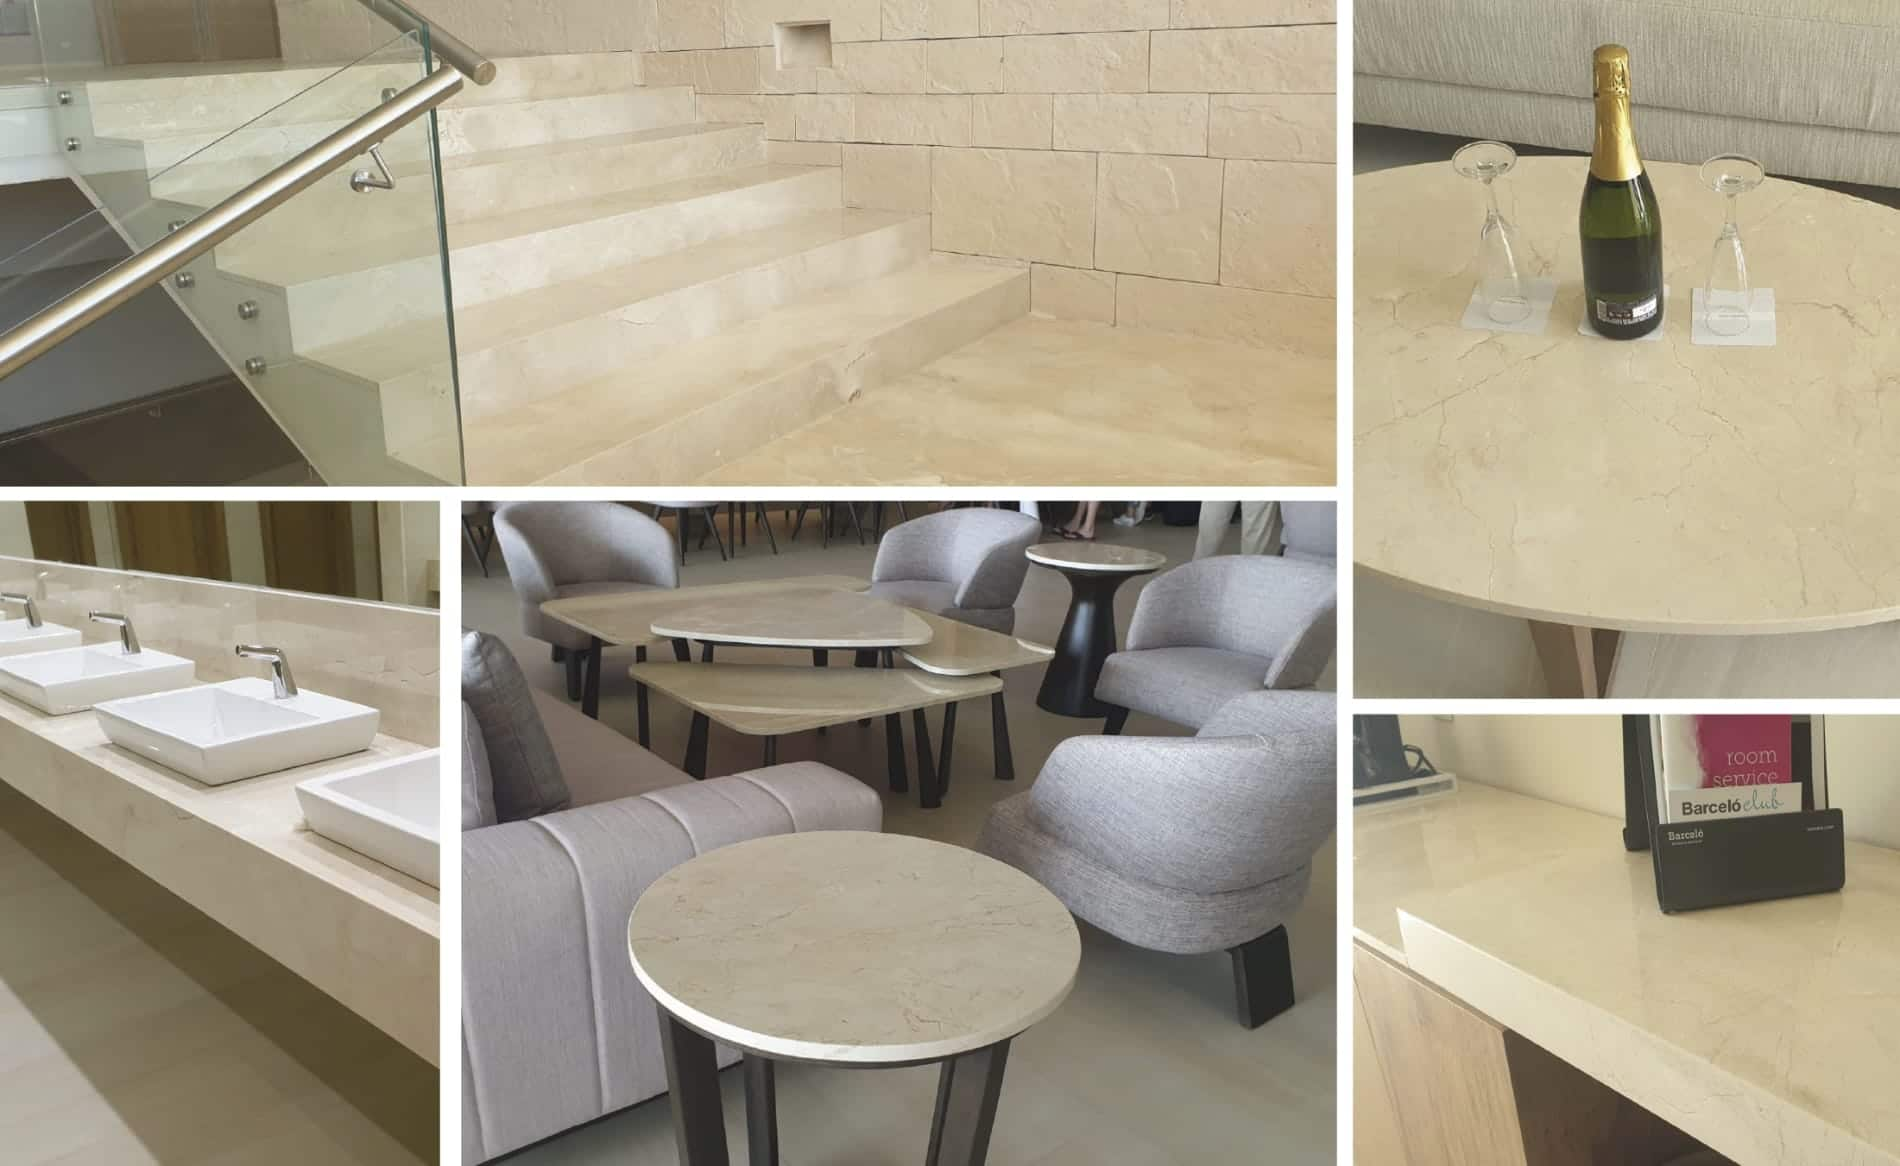 mármol crema marfil - hotel barceló en Cancún